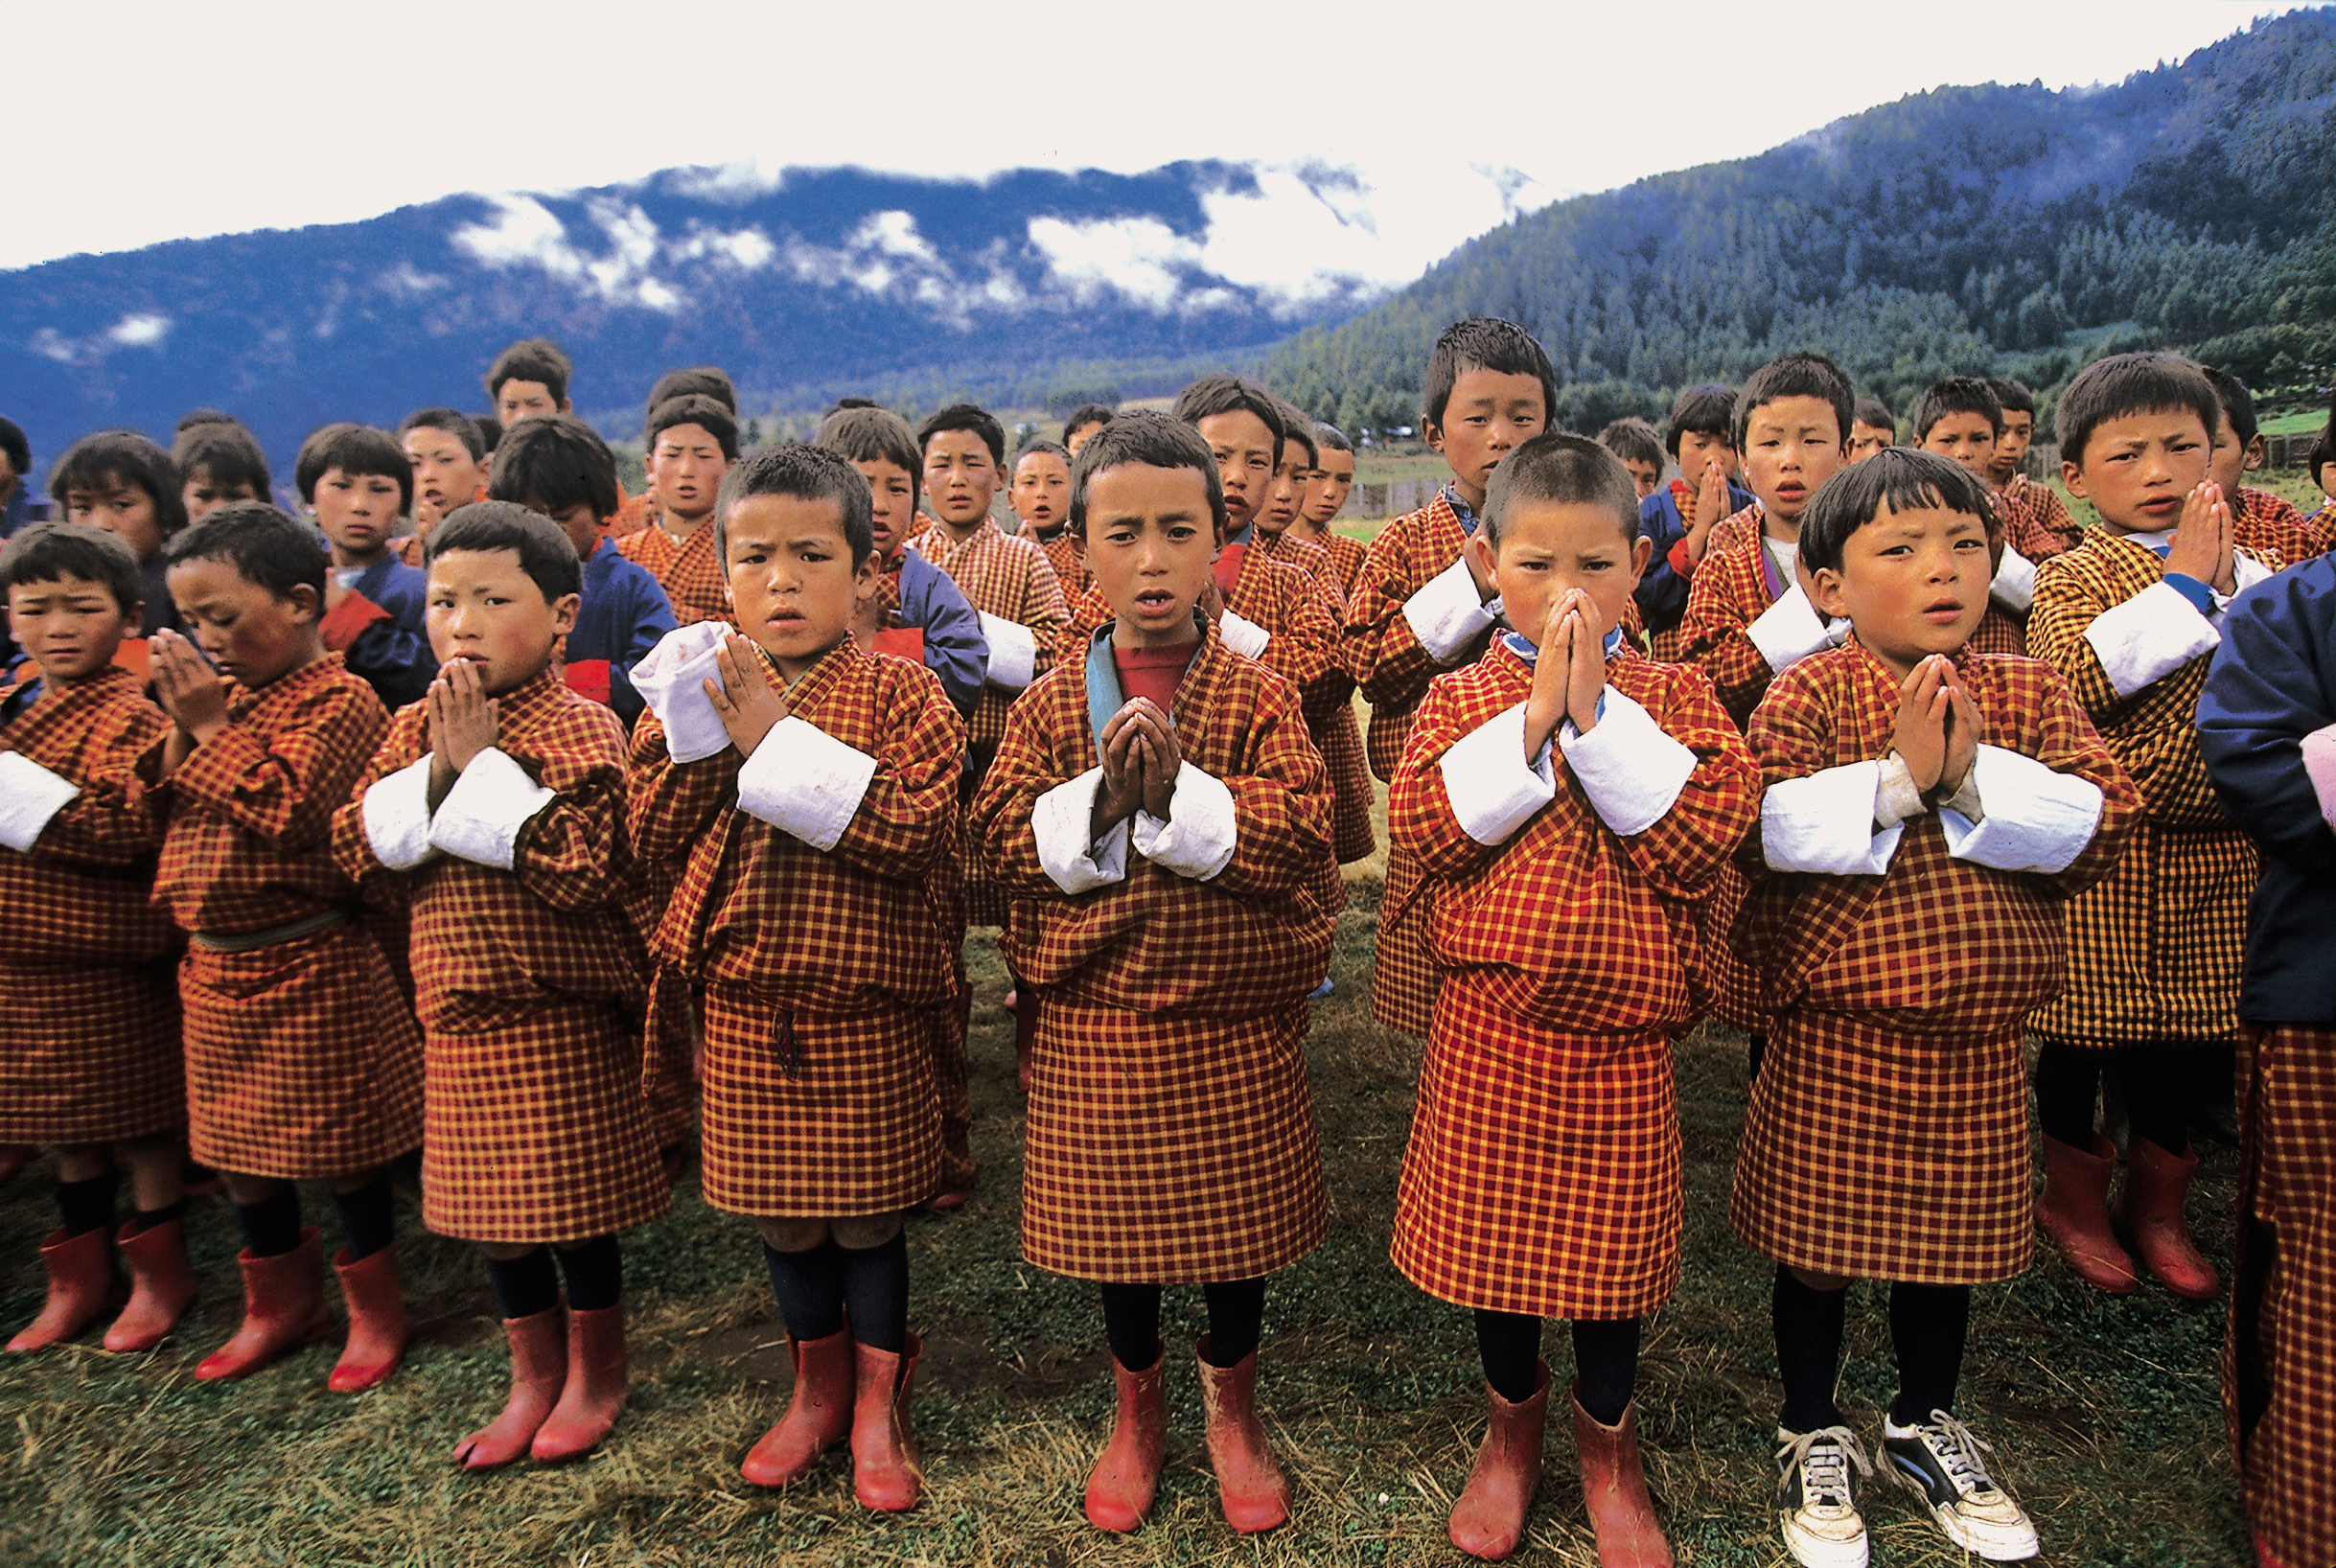 Schoolchildren performing morning prayers at school assembly in Bhutan.